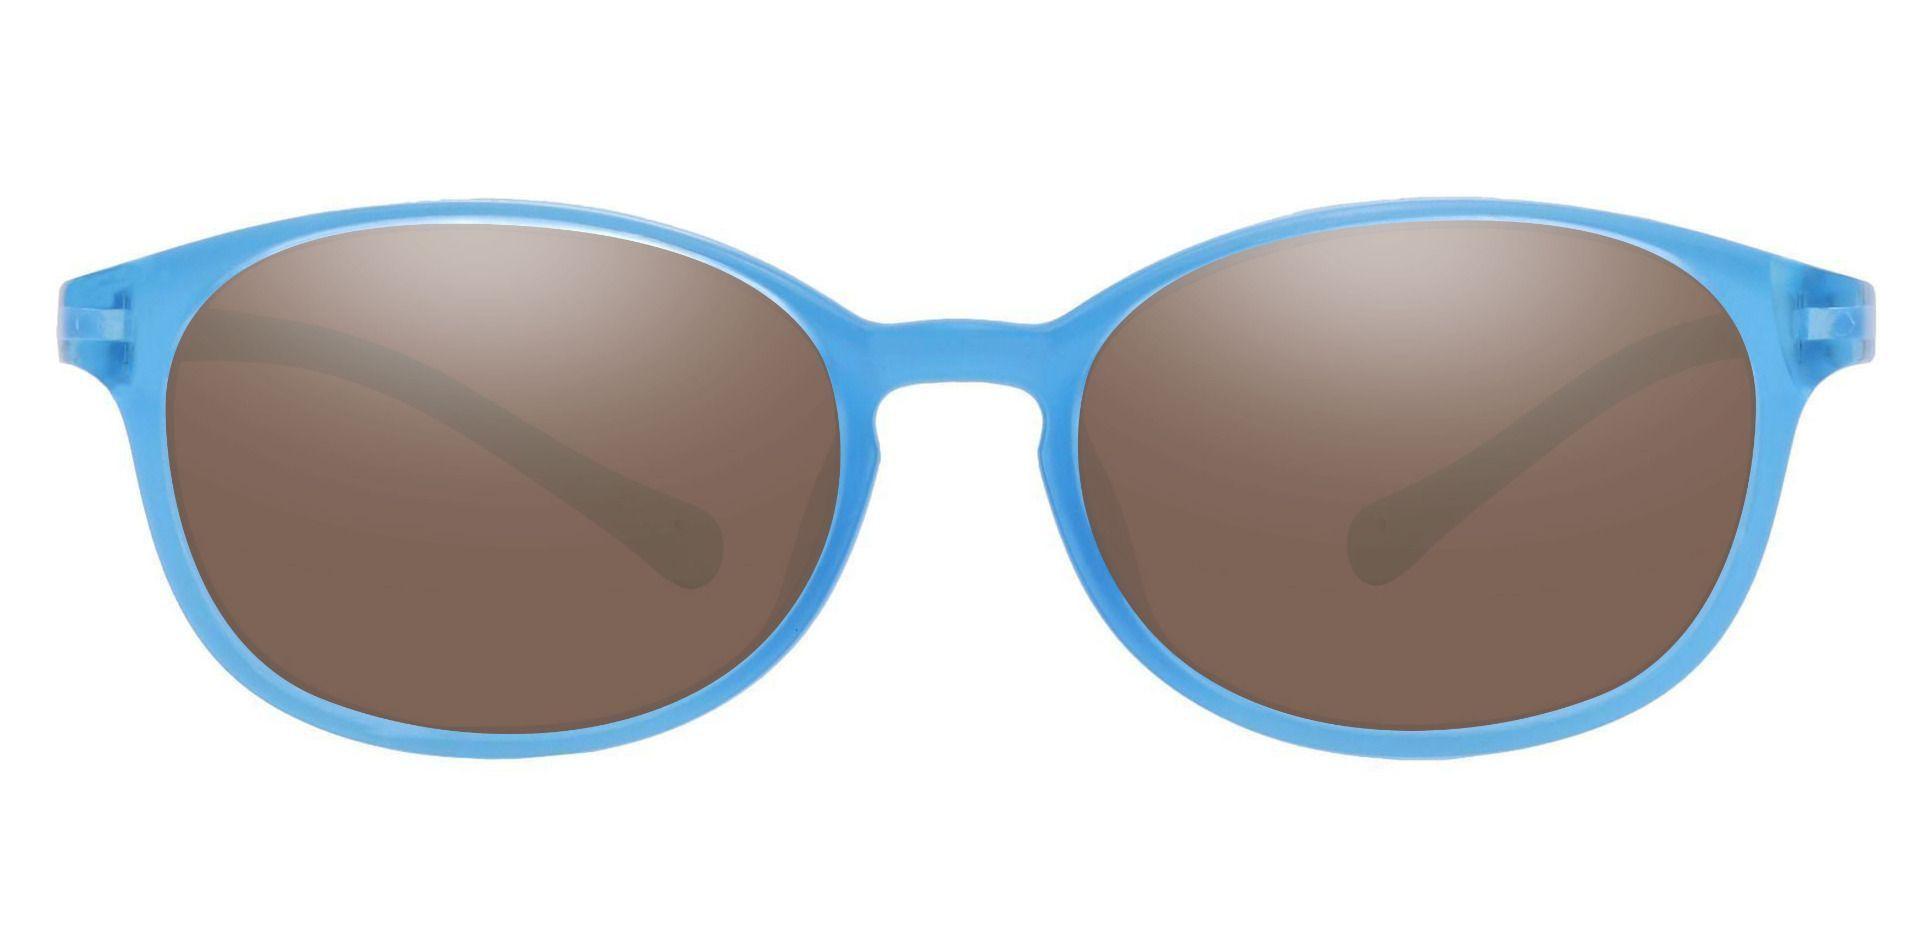 Sapphire Oval Prescription Sunglasses - Blue Frame With Brown Lenses